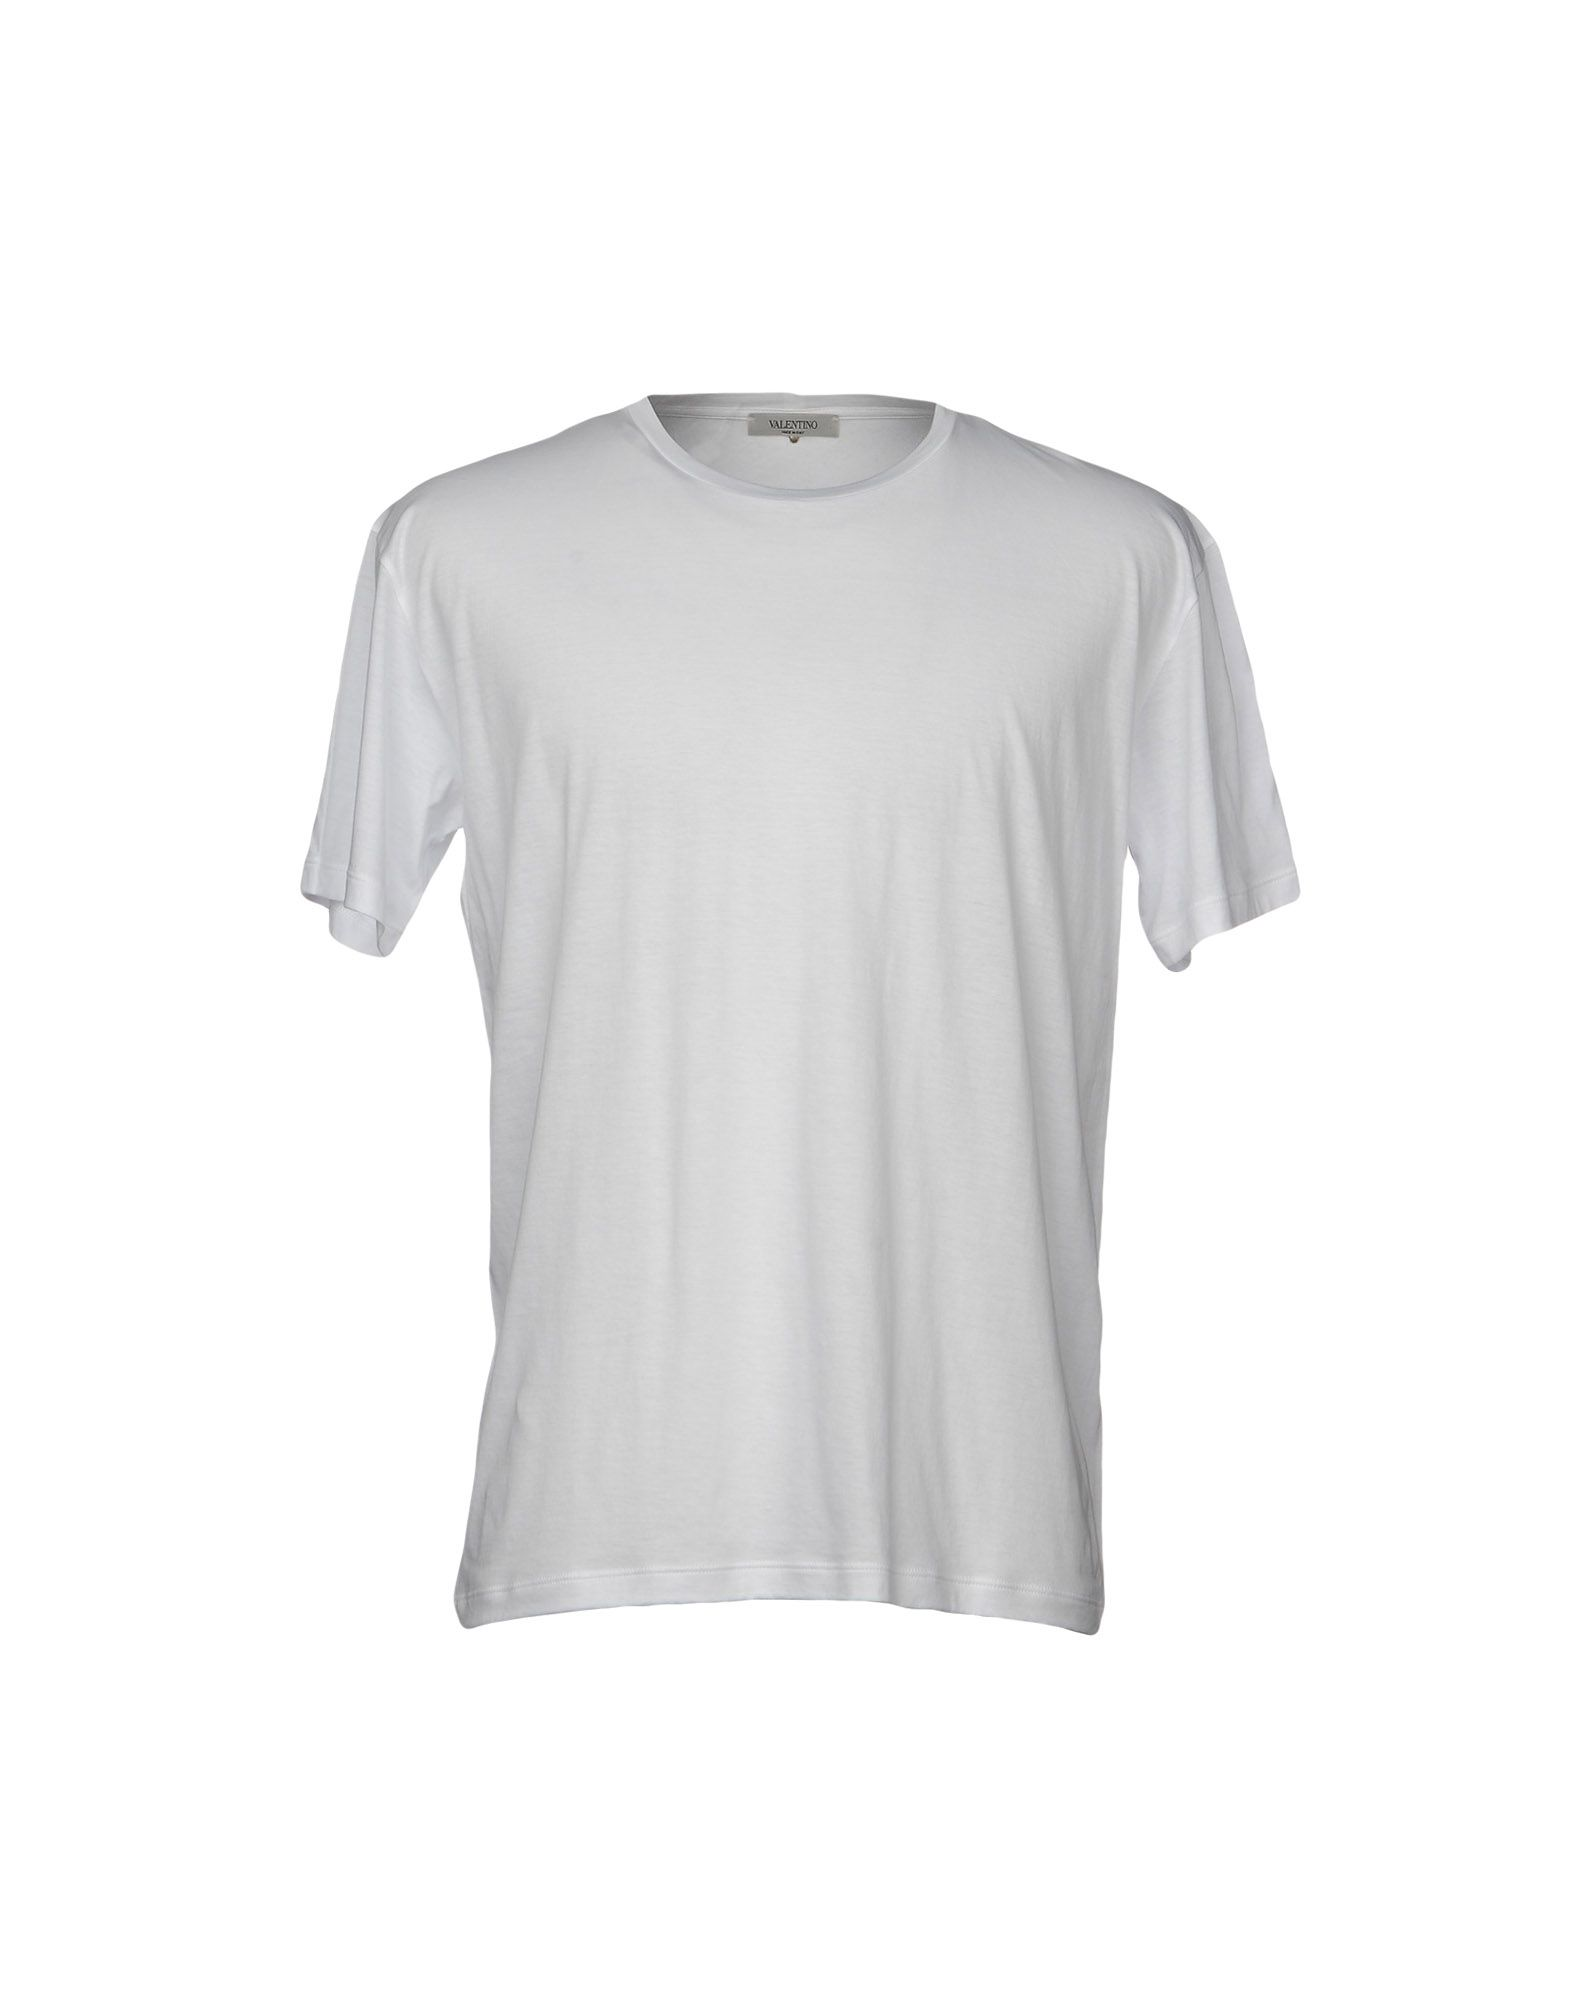 A buon mercato A mercato buon mercato A T-Shirt Valentino Uomo - 12098669JF 117640